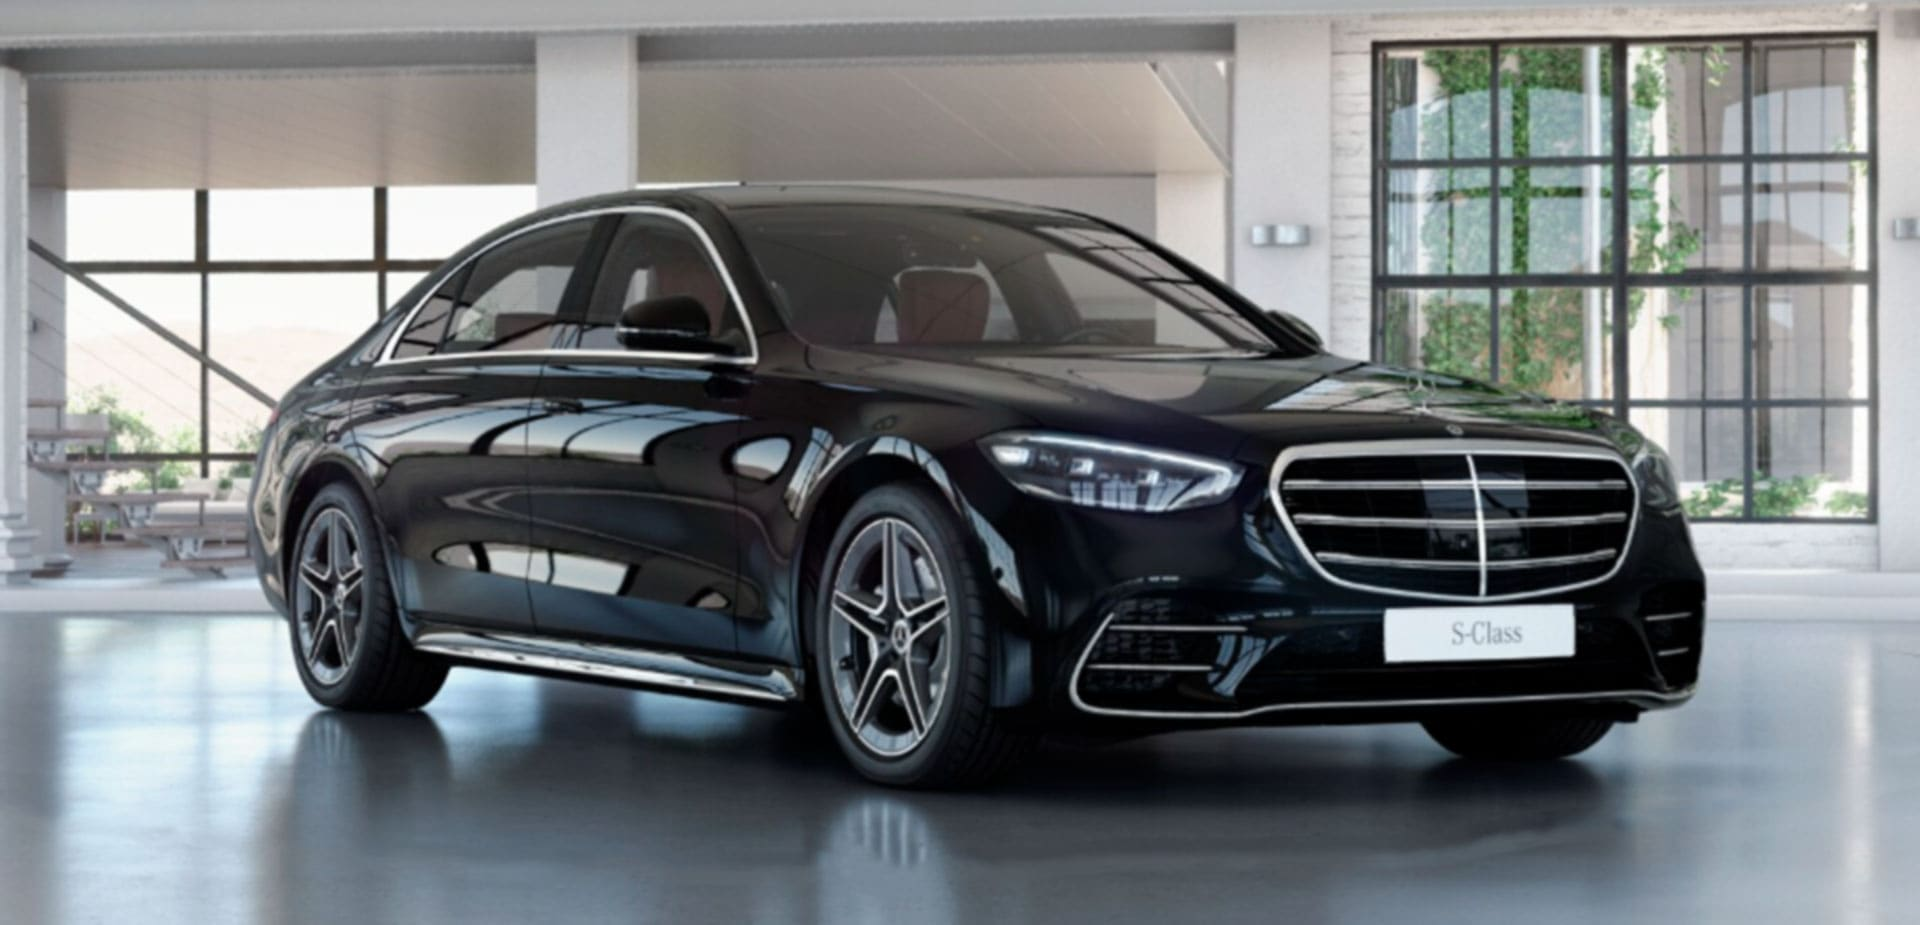 Mercedes-Benz S-Class Limousine 0052600195